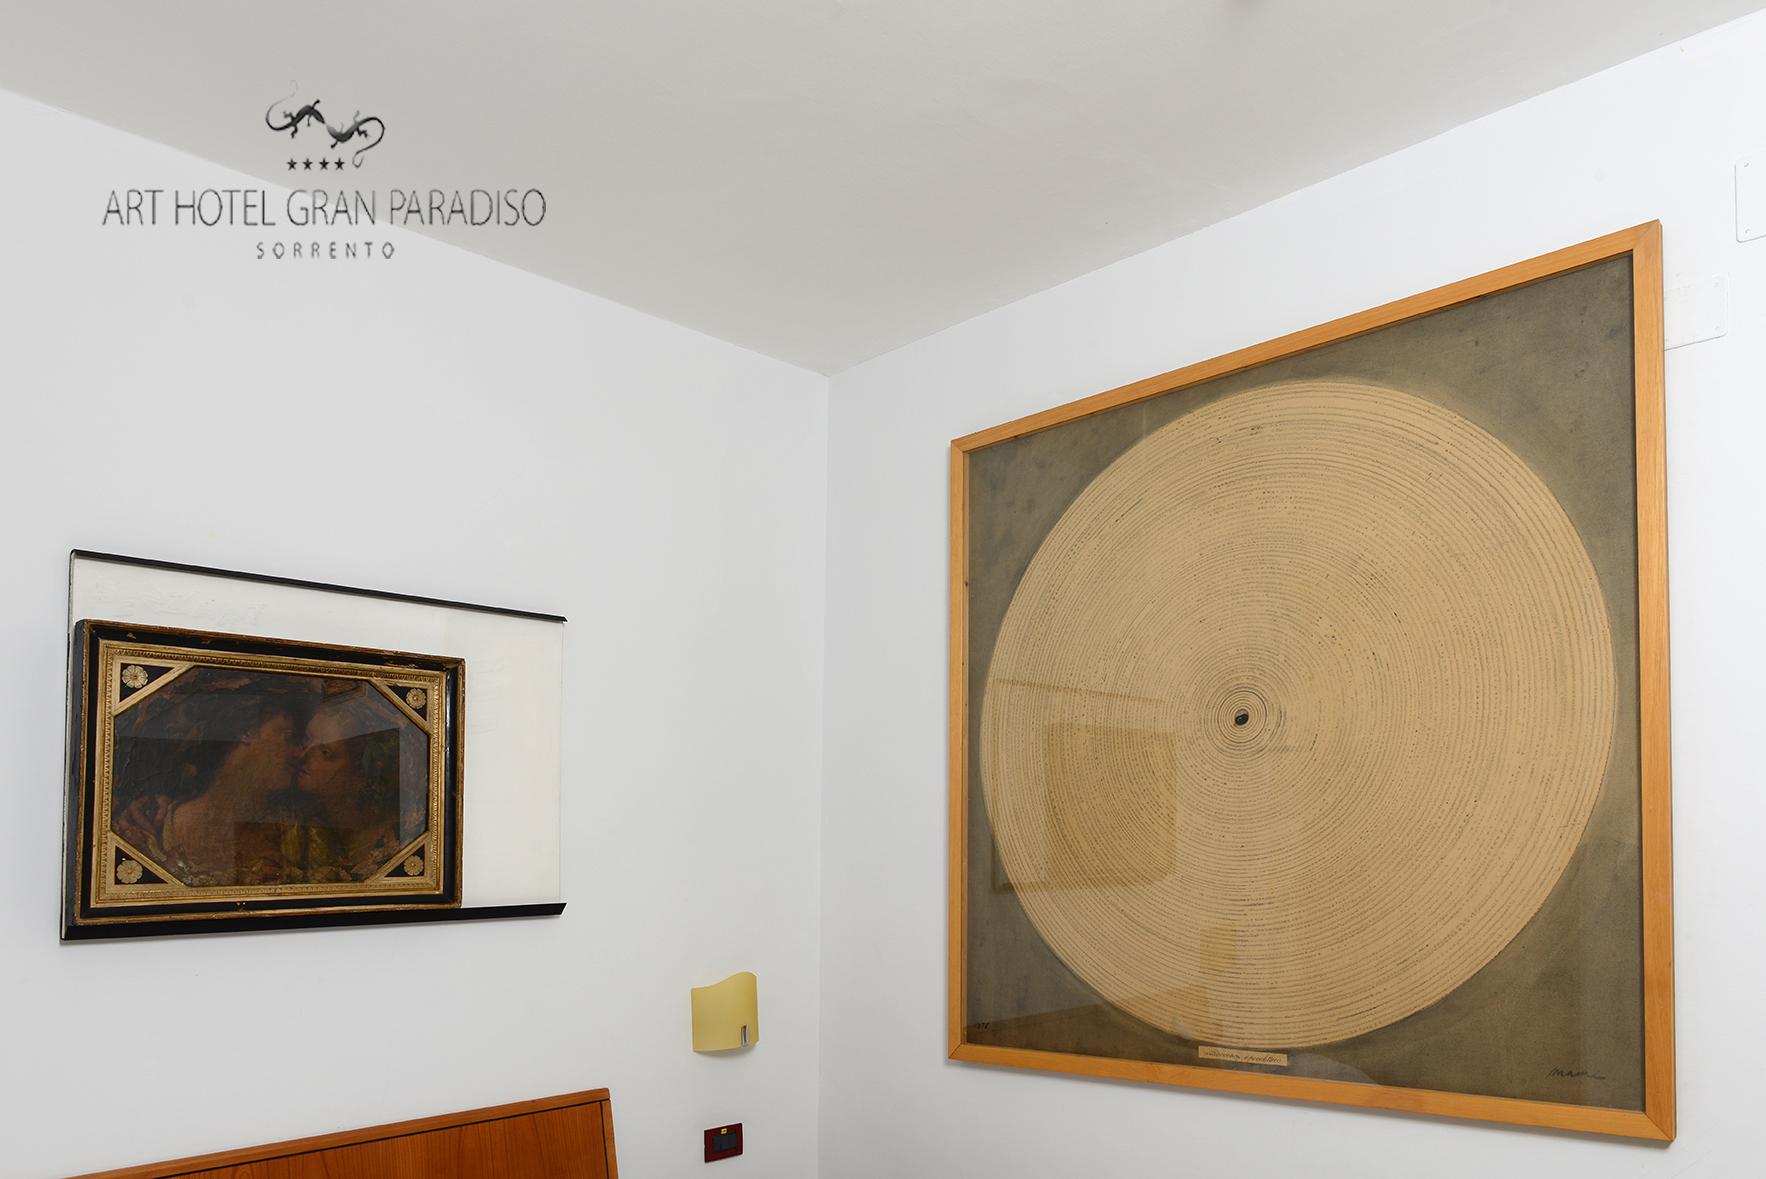 Art_Hotel_Gran_Paradiso_2013_313_Fabio_Mauri_3.jpg